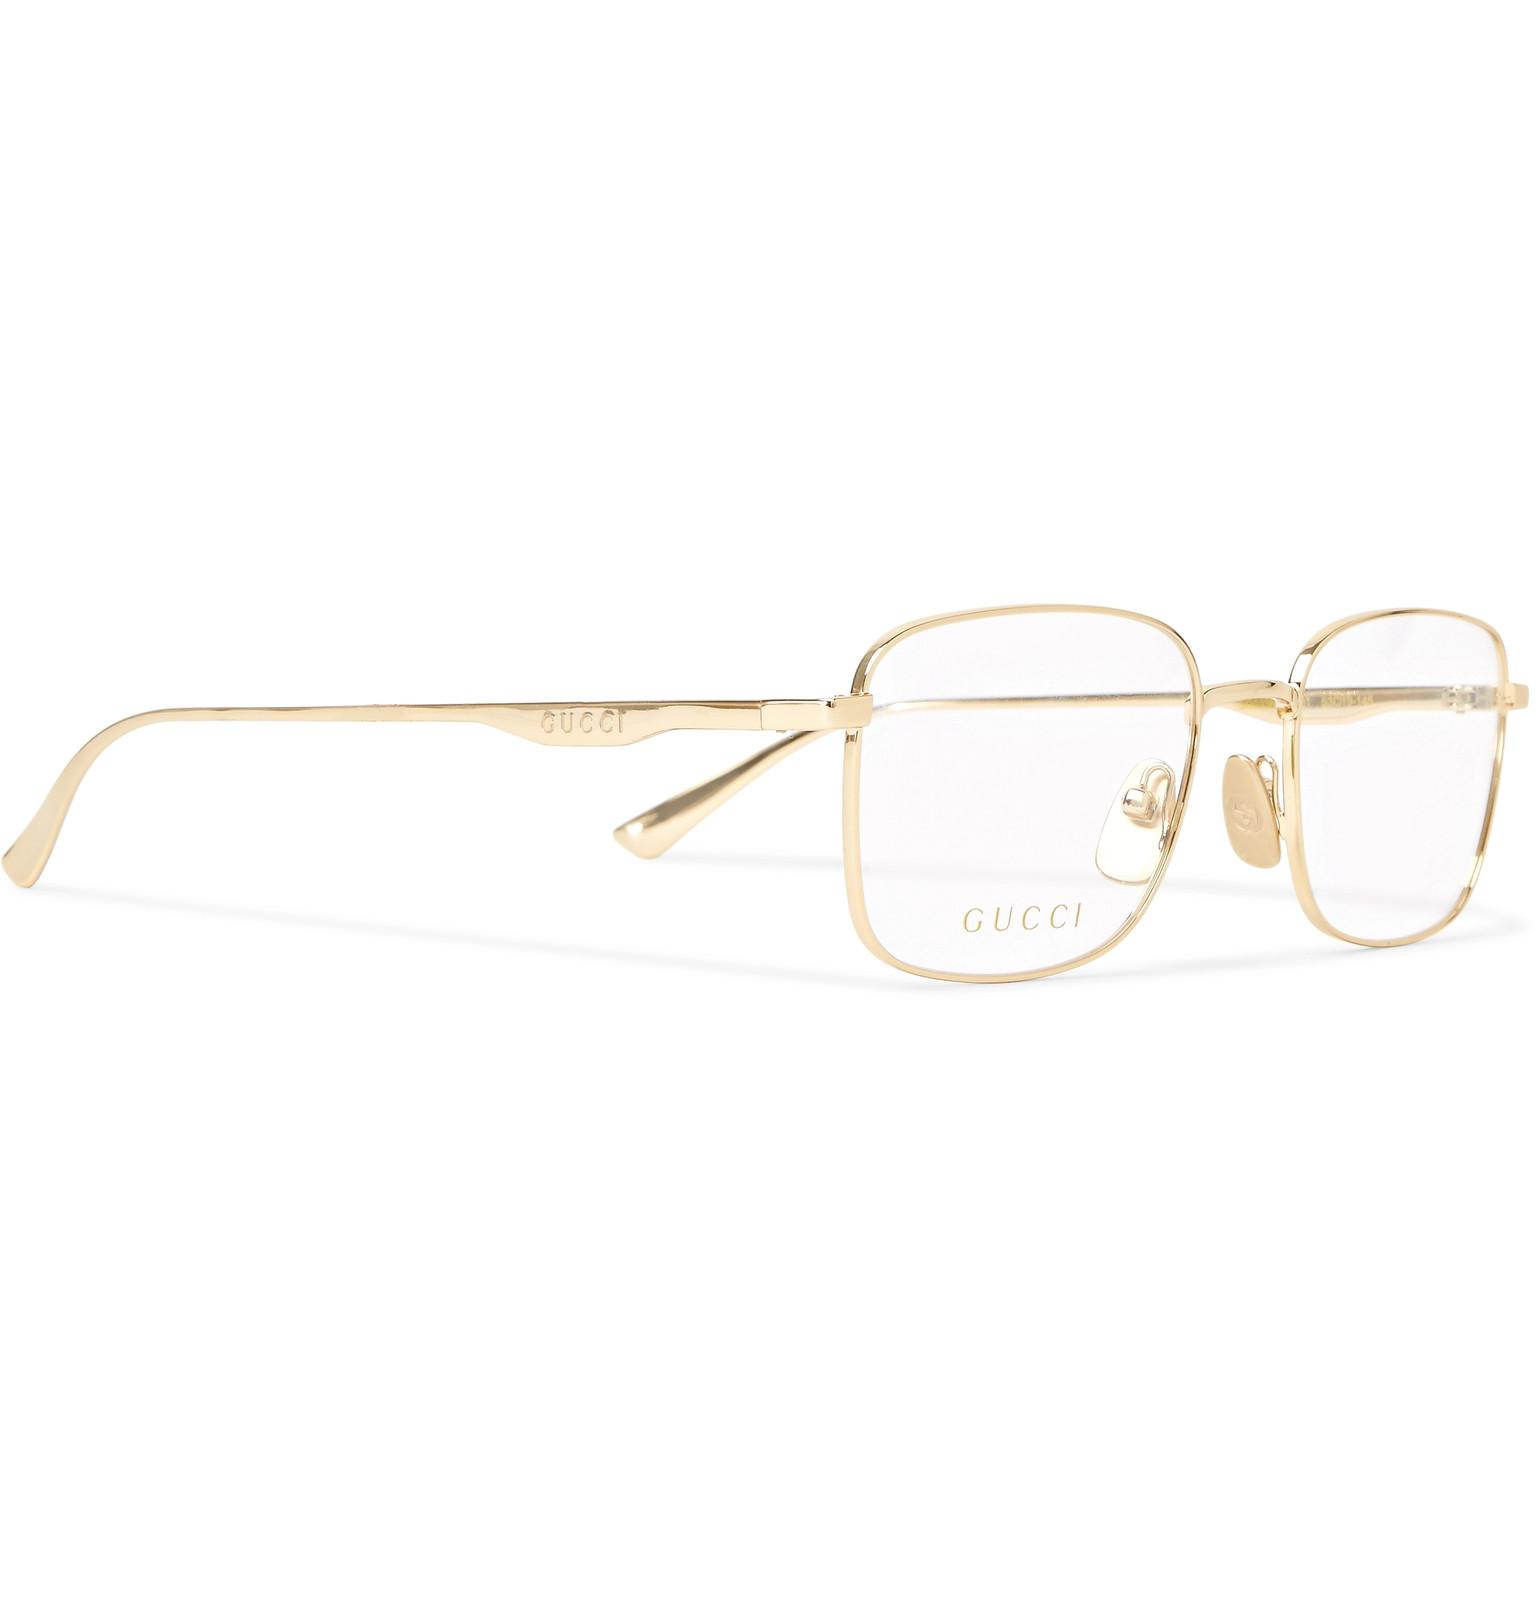 c986d3db12 Gucci - Square-Frame Gold-Tone Optical Glasses